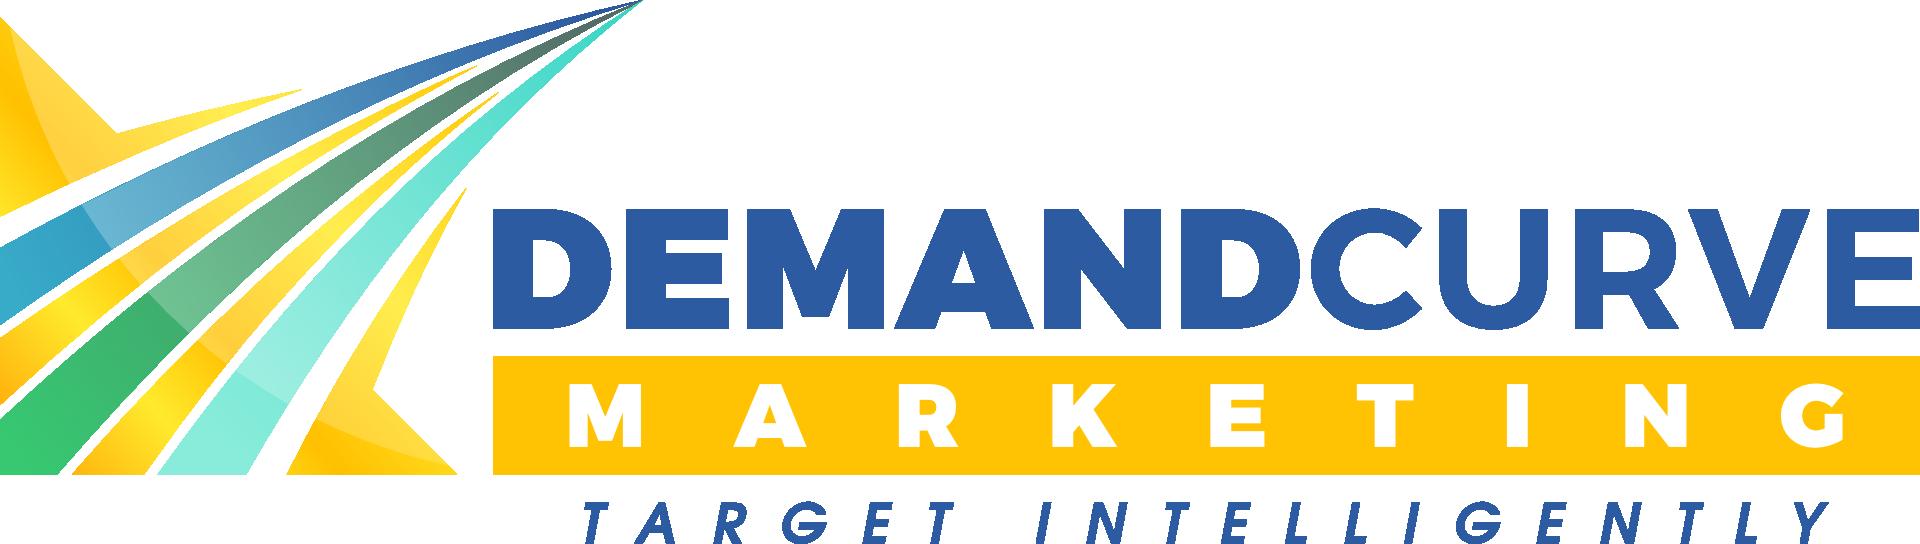 DemandCurveMarketing's Company logo